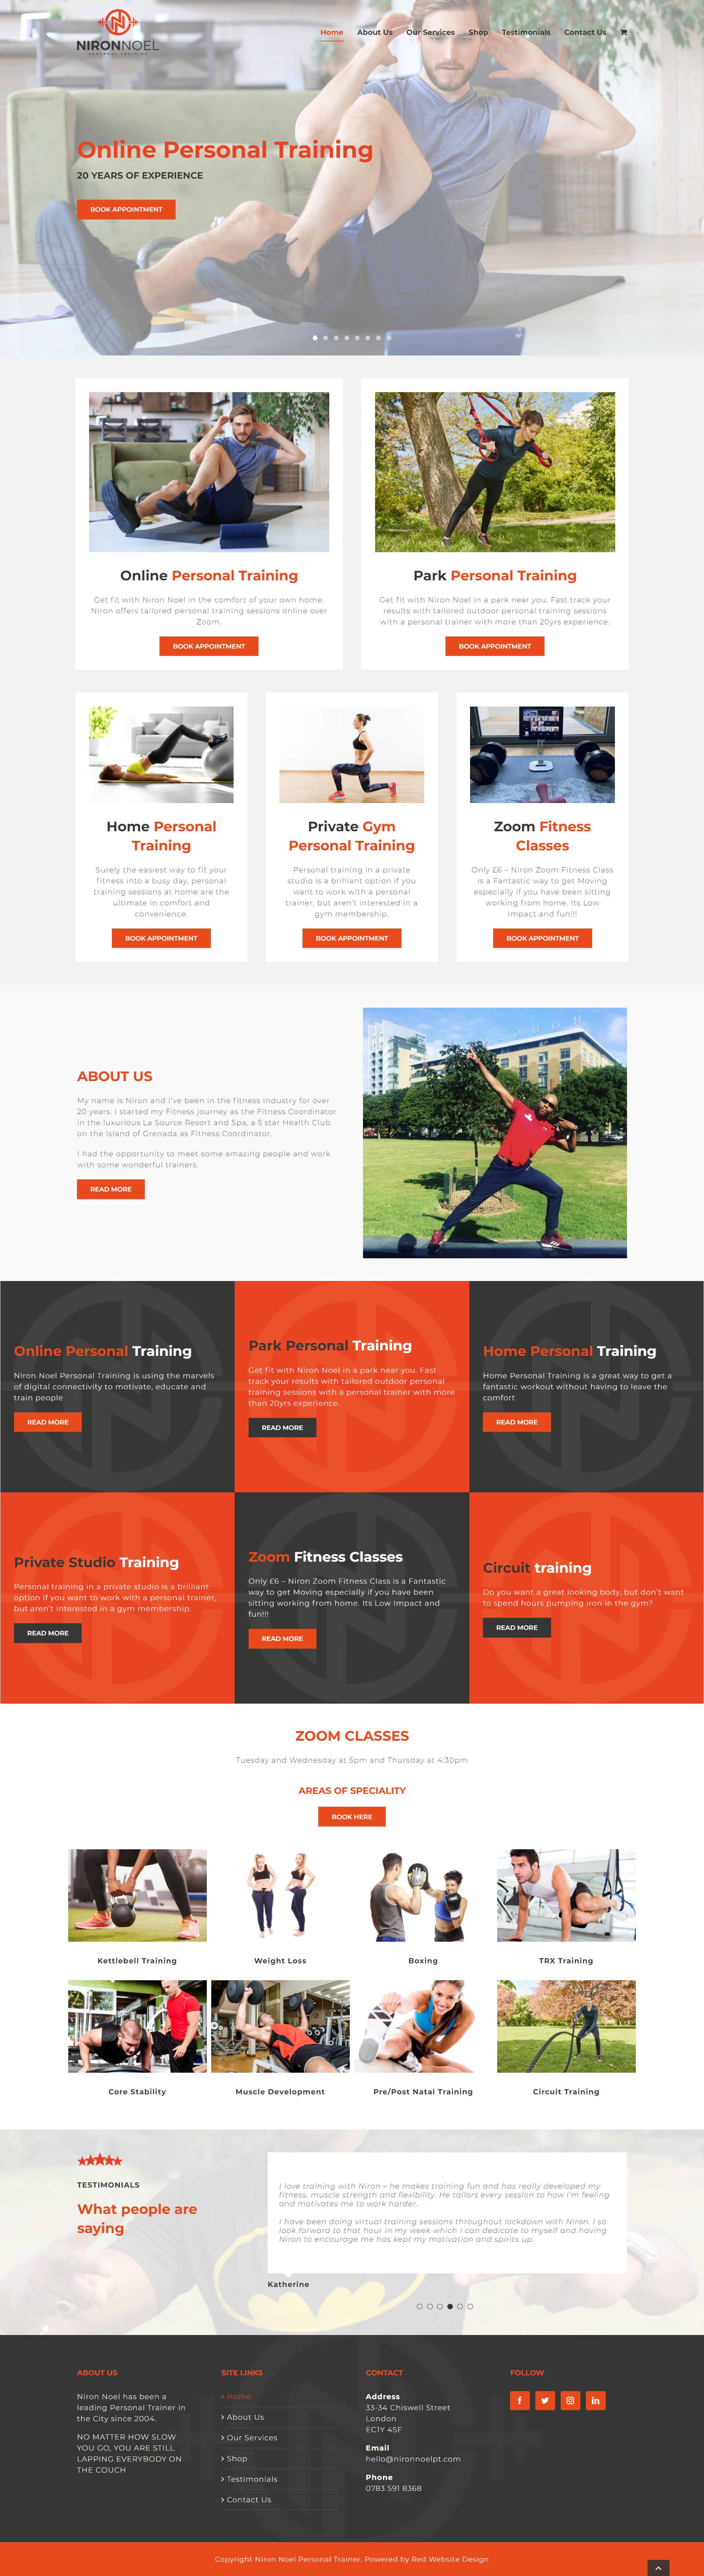 Web Design Barbican